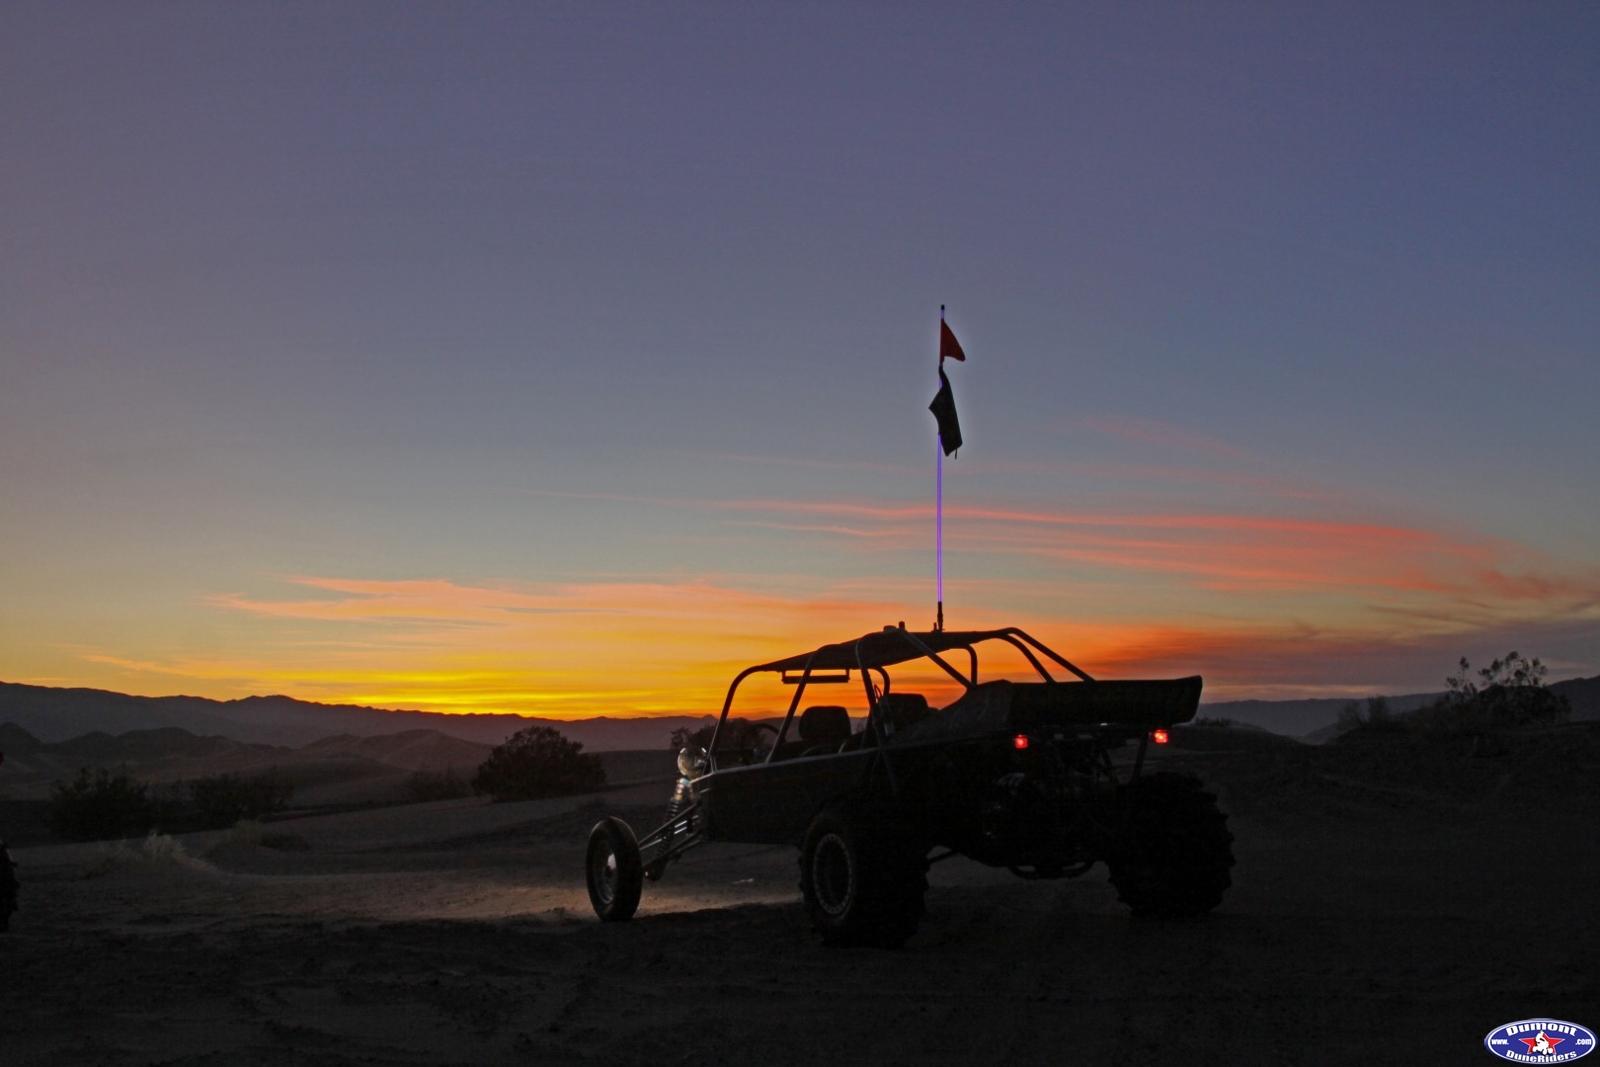 Saturday sunset